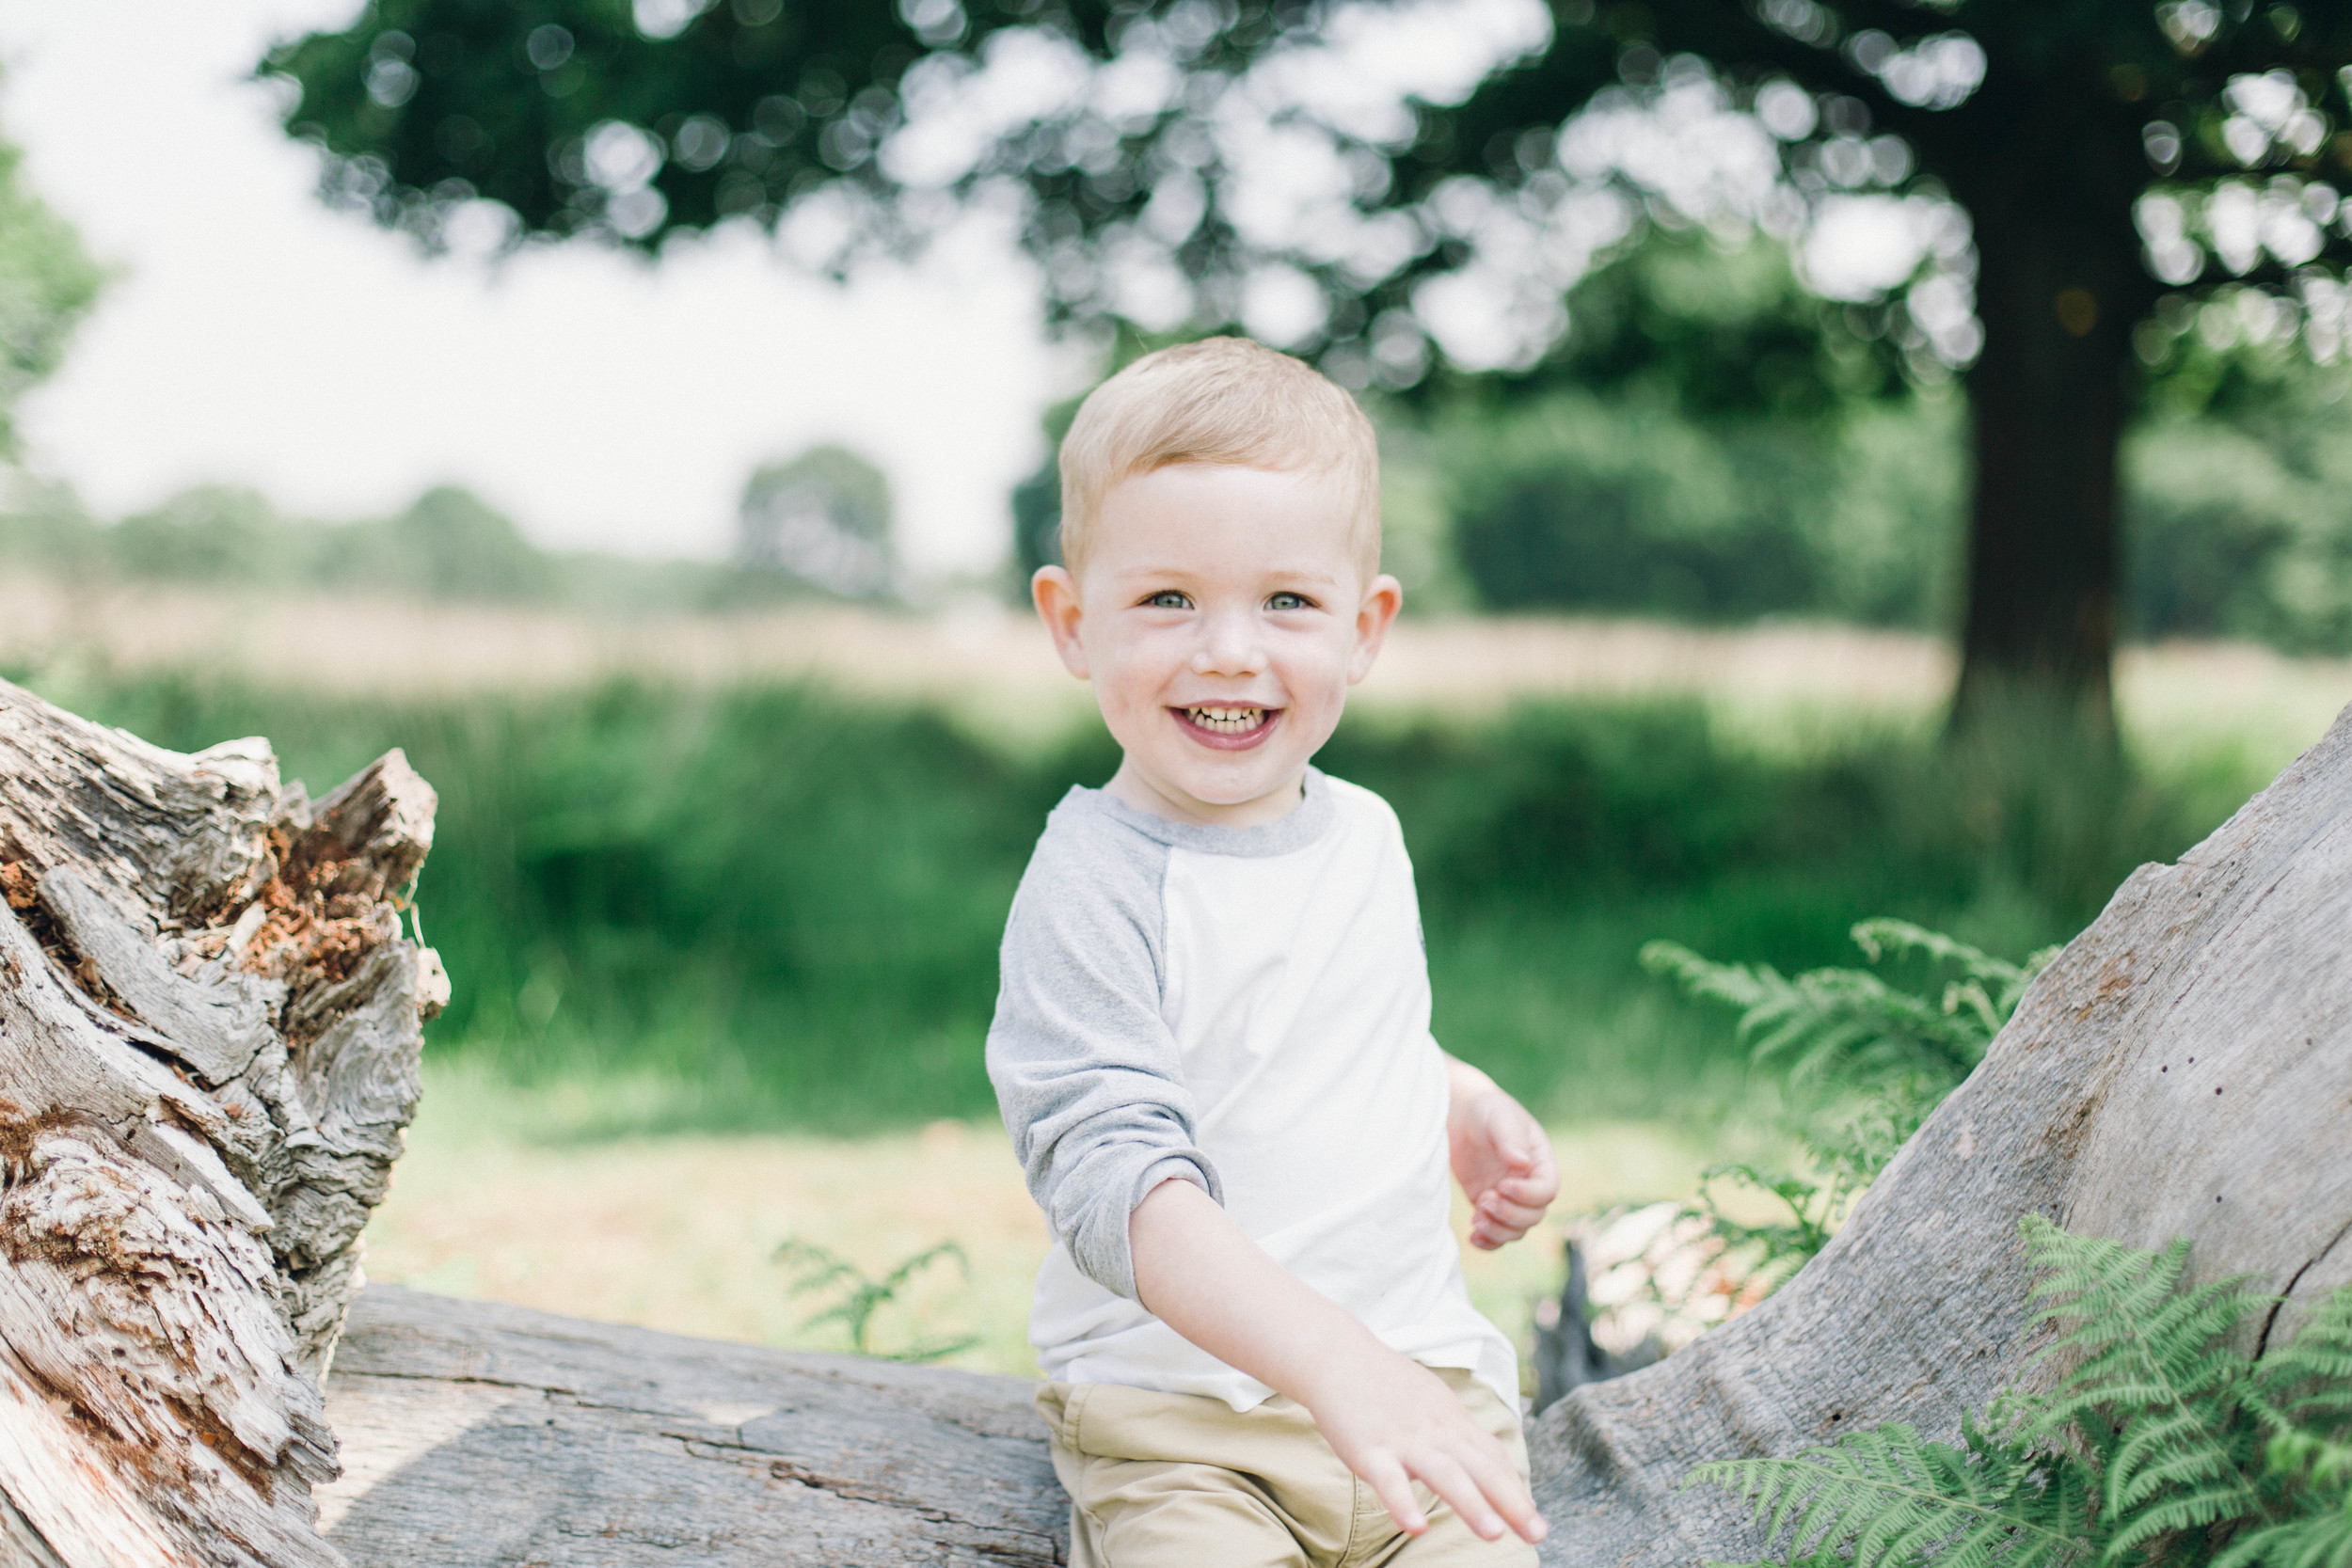 Lelya_LittleKinPhotography_family_photoshoot_Richmond-69.jpg